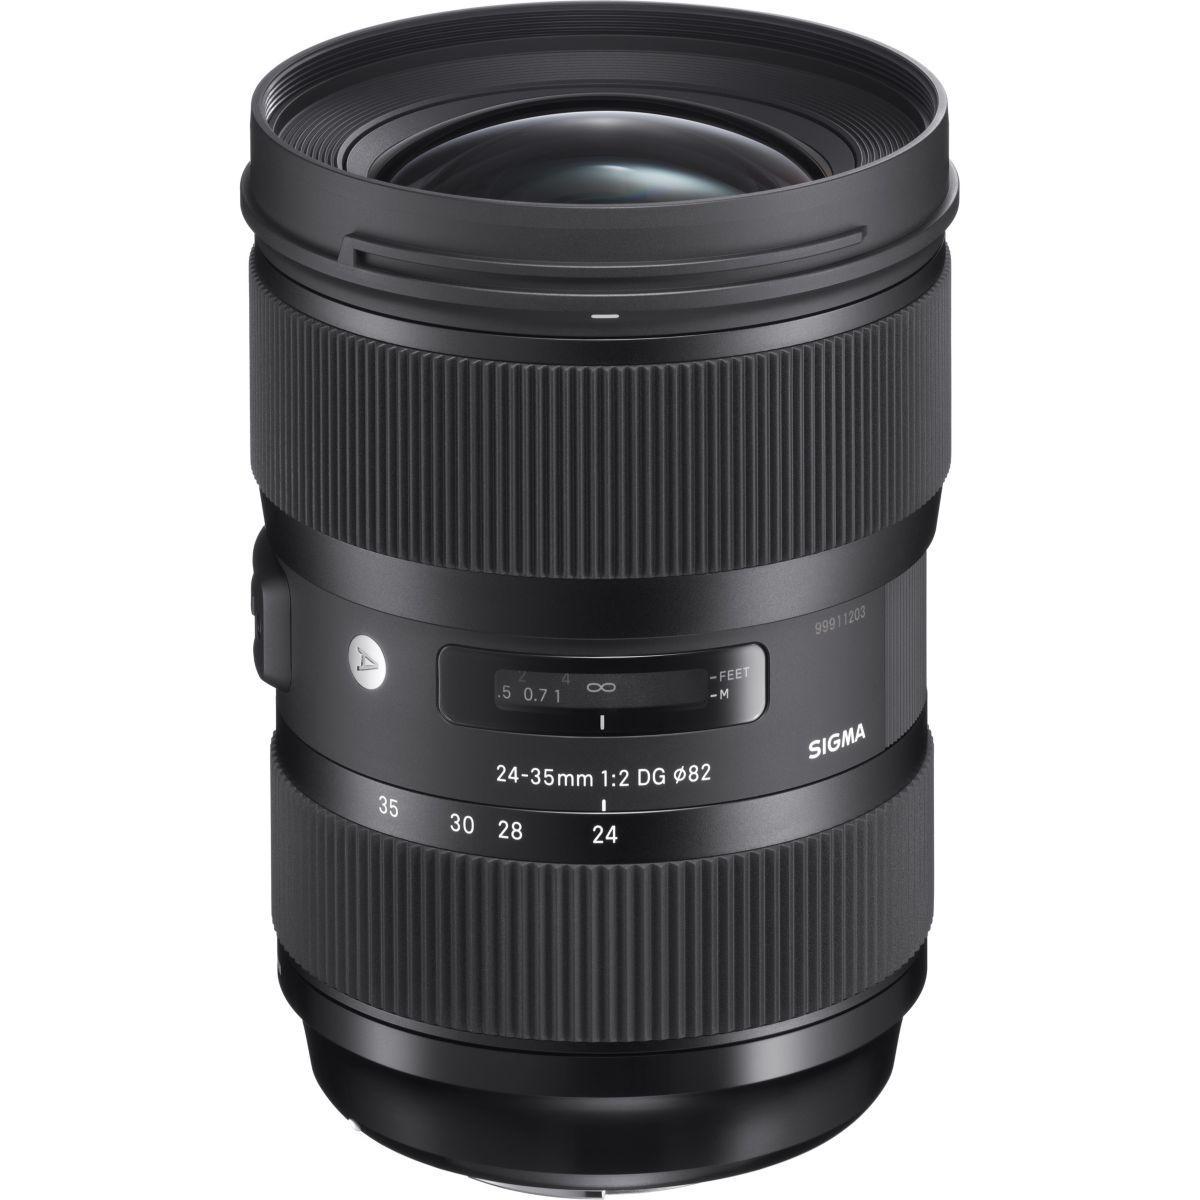 Objectif pour reflex plein format sigma 24-35mm f2 dg hsm art ...